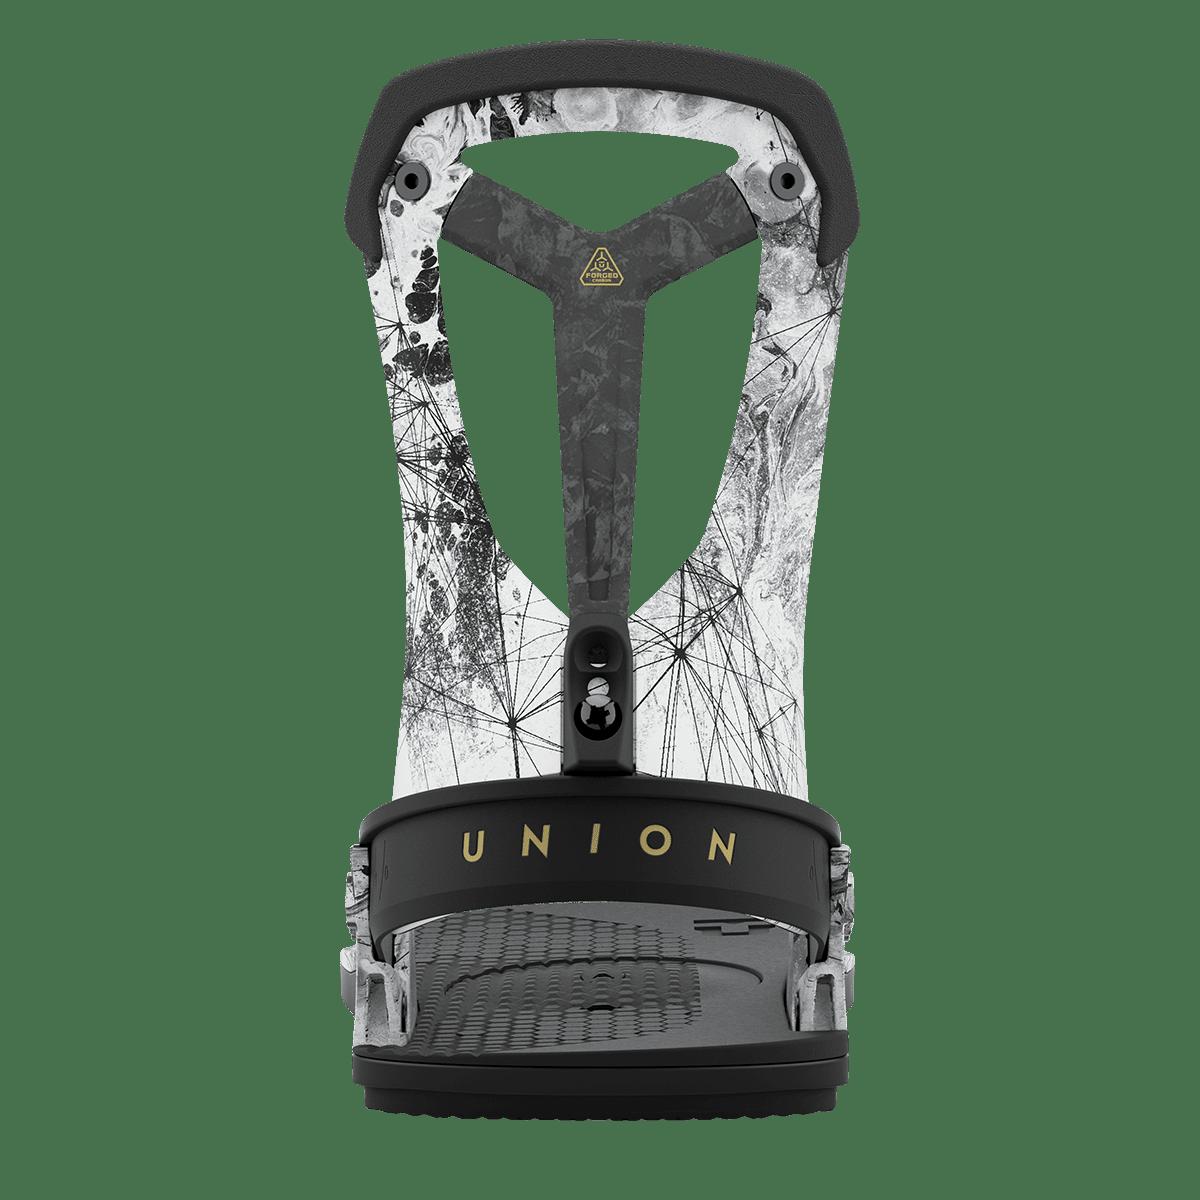 Union Union Men's Falcor Snowboard Binding (2021)